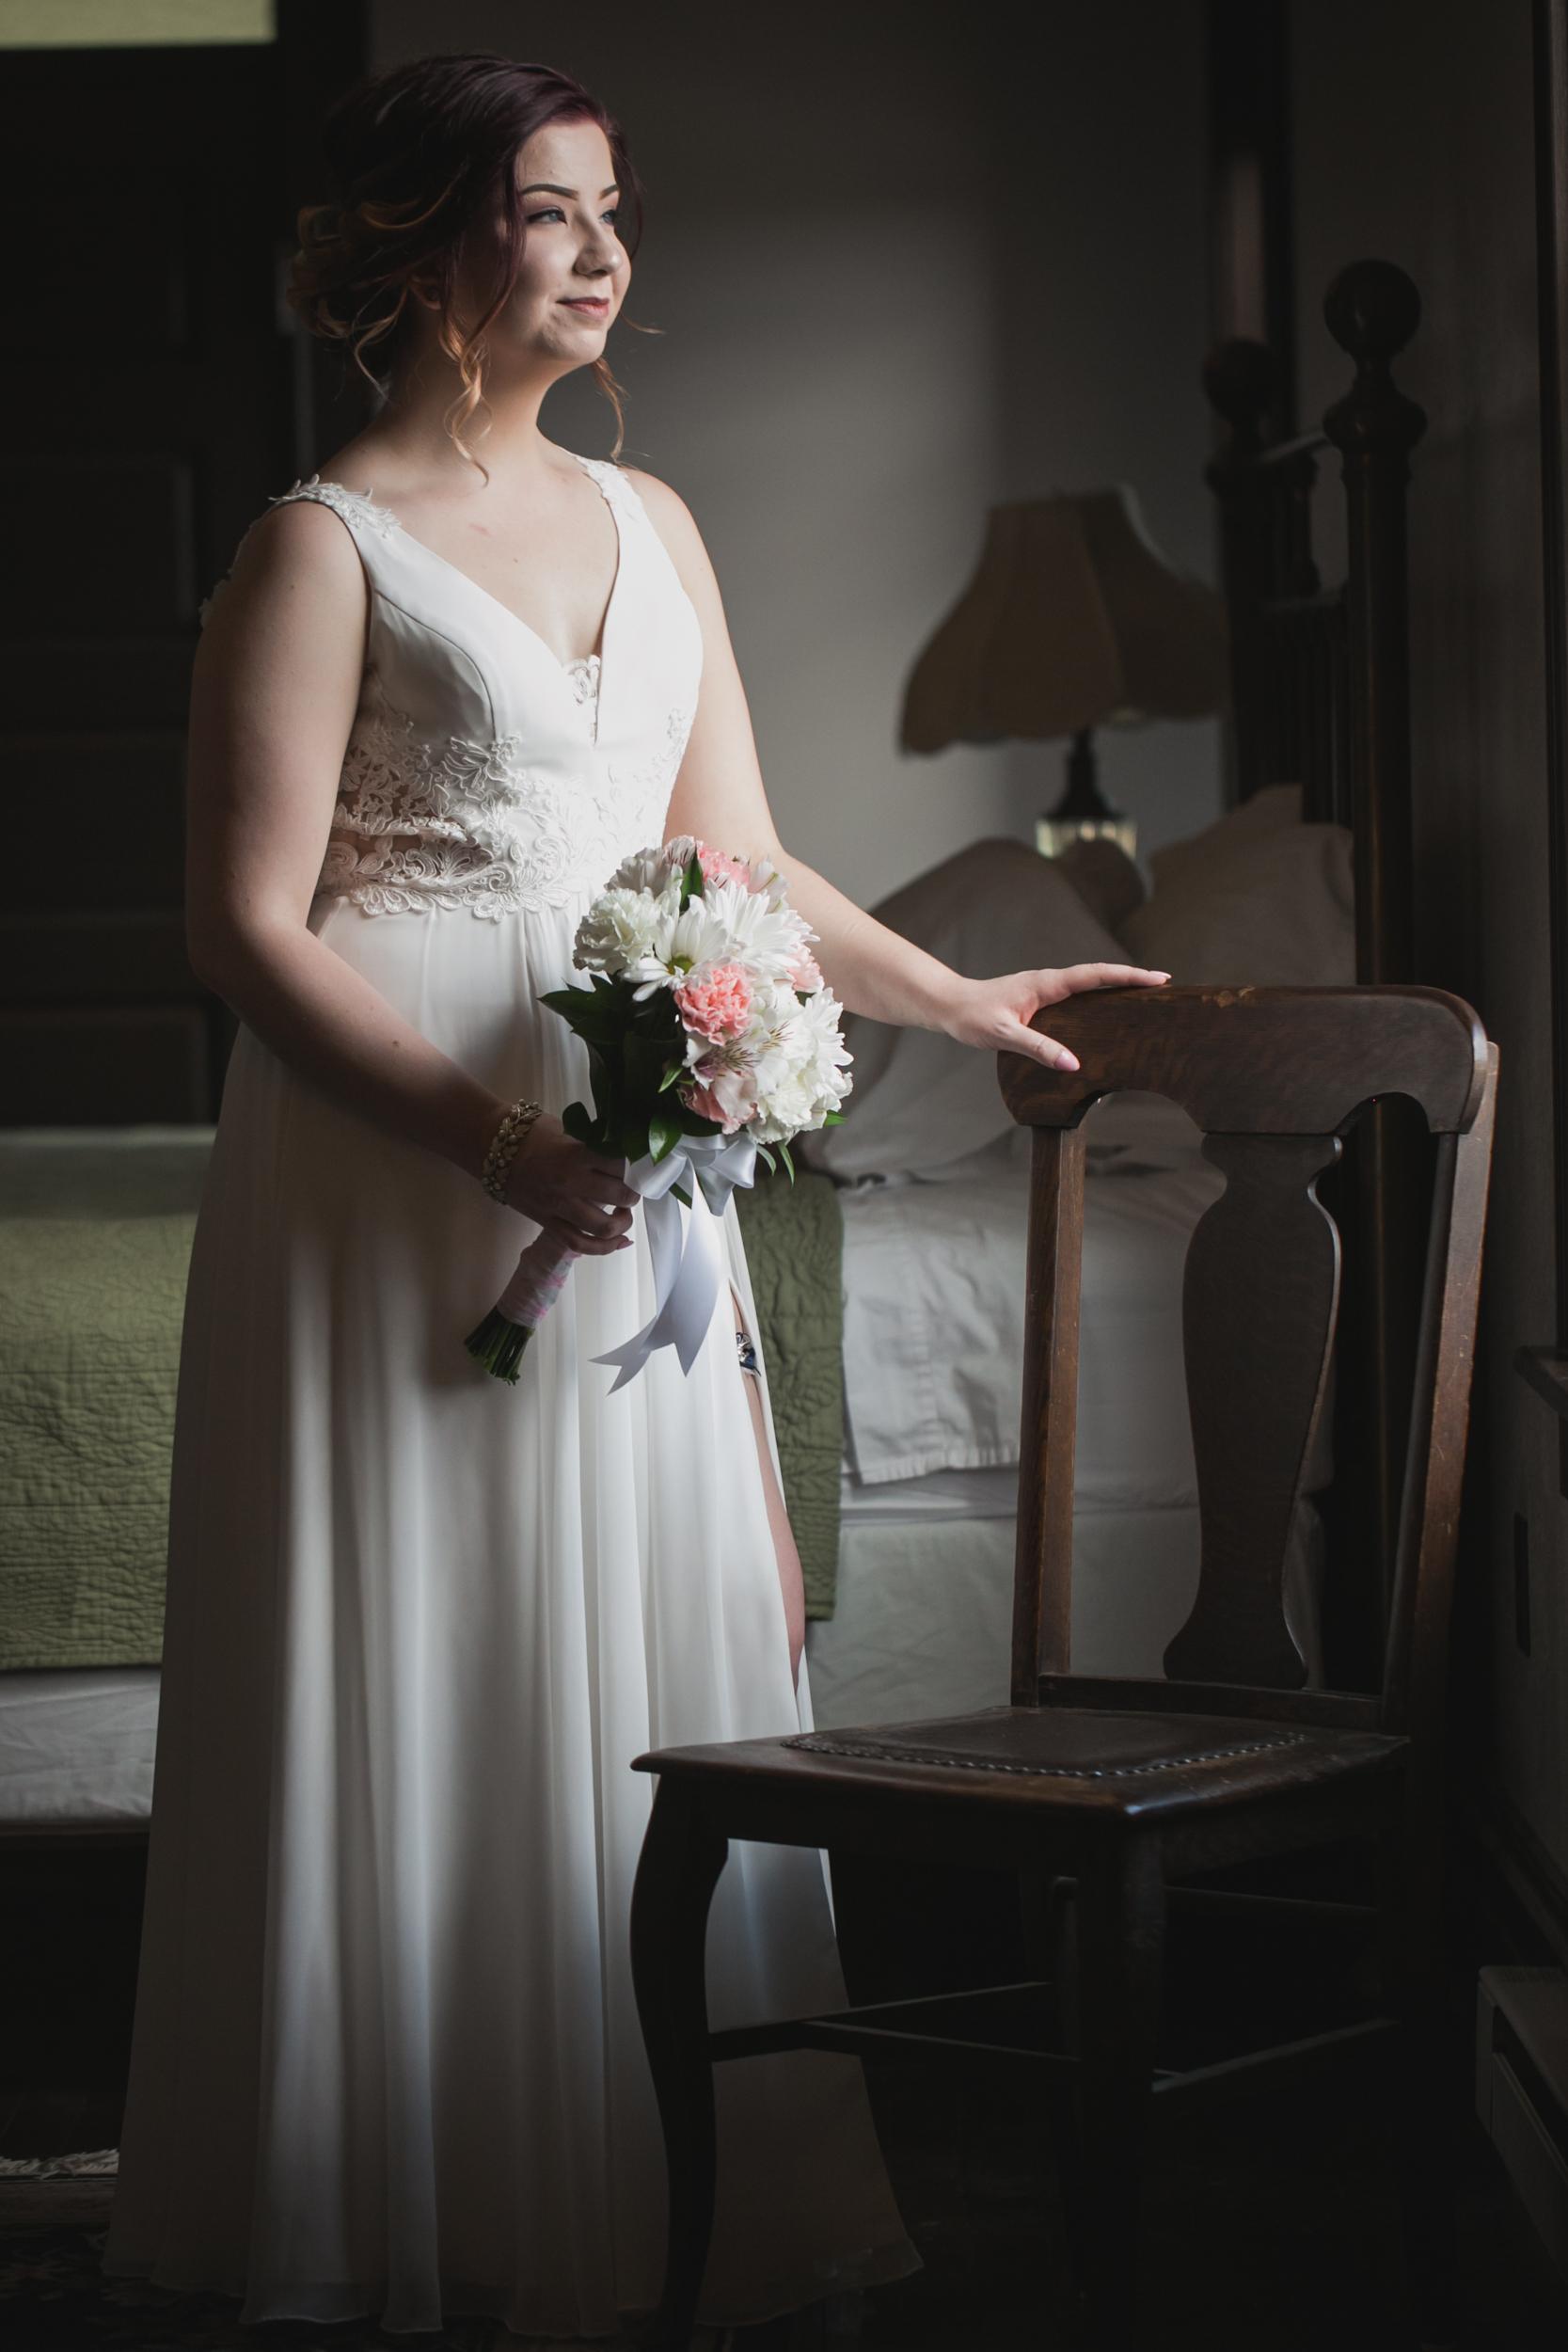 intimate elopement wedding, duluth mn, duluth mn elopement wedding, -www.rachelsmak.com9.jpg